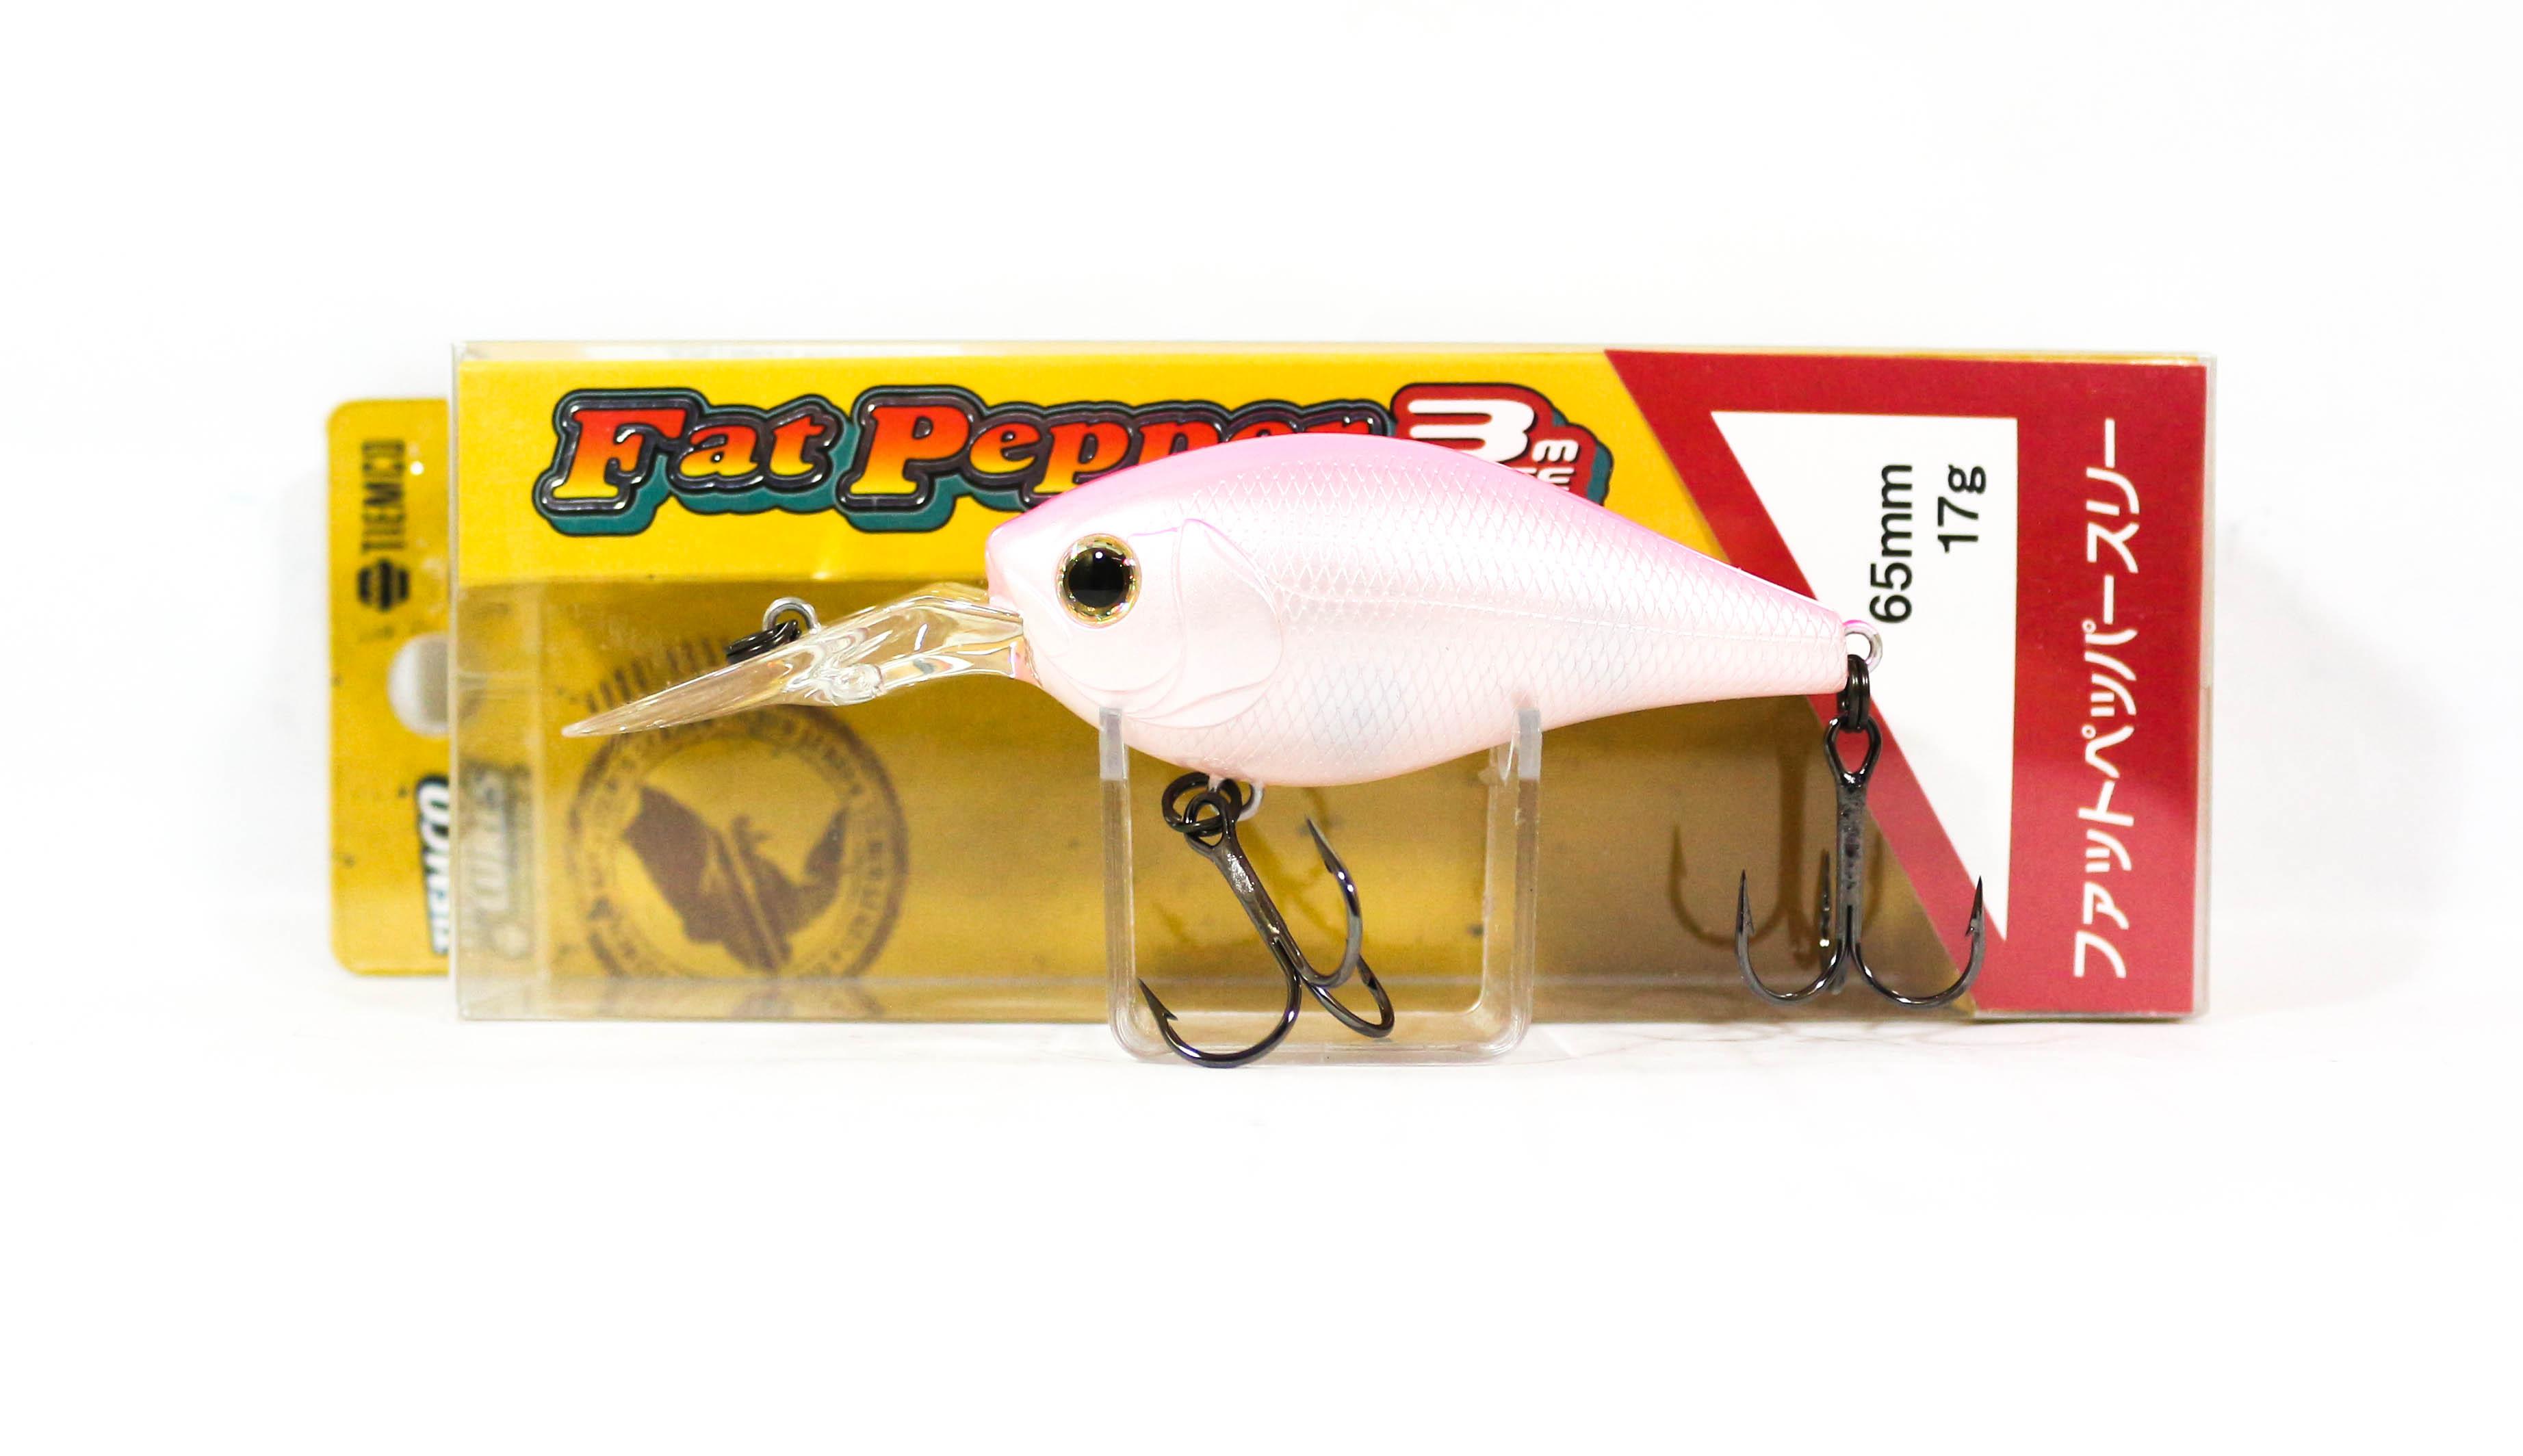 Tiemco Fat Pepper Three FP3 Diving Crank Bait Floating Lure 316 (2864)